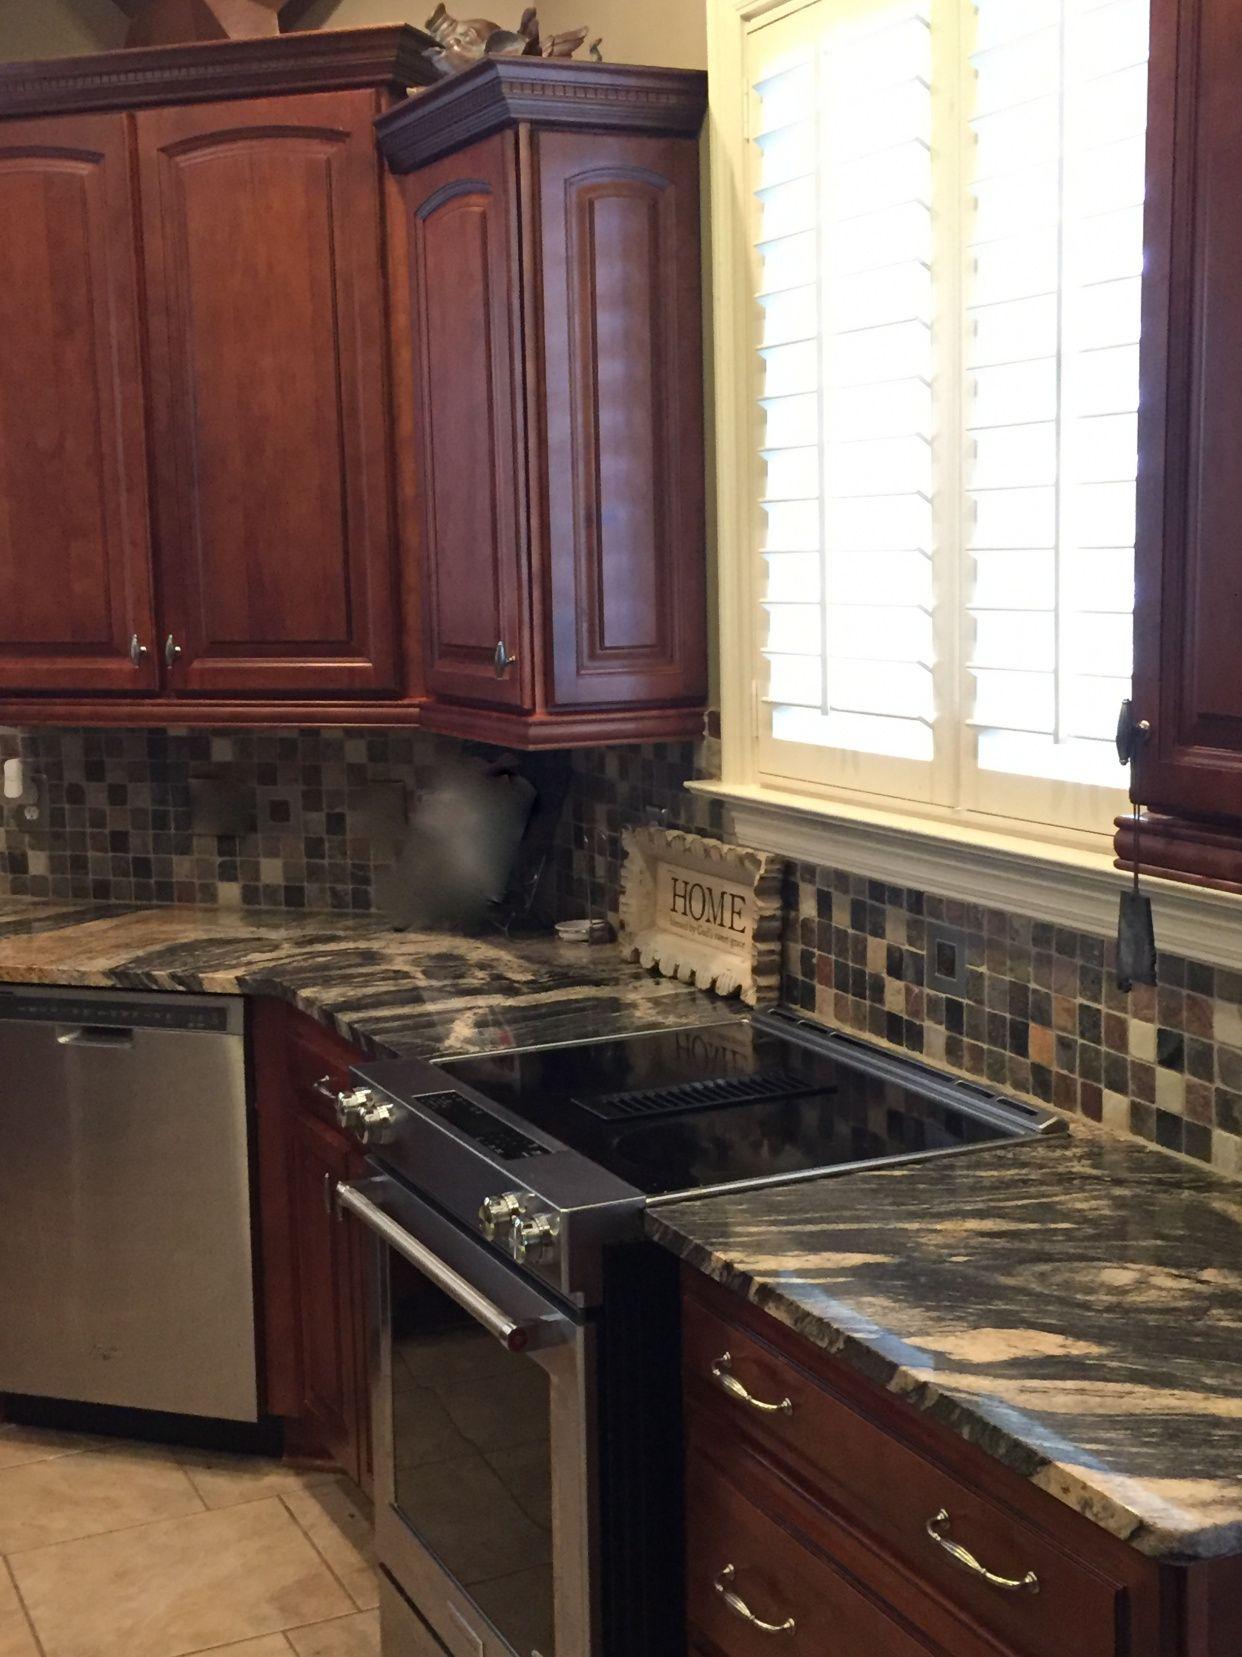 50+ African Granite Countertops - Backsplash for Kitchen Ideas Check on kitchens with oak trim, kitchens with oak floors, kitchens with oak cabinets,